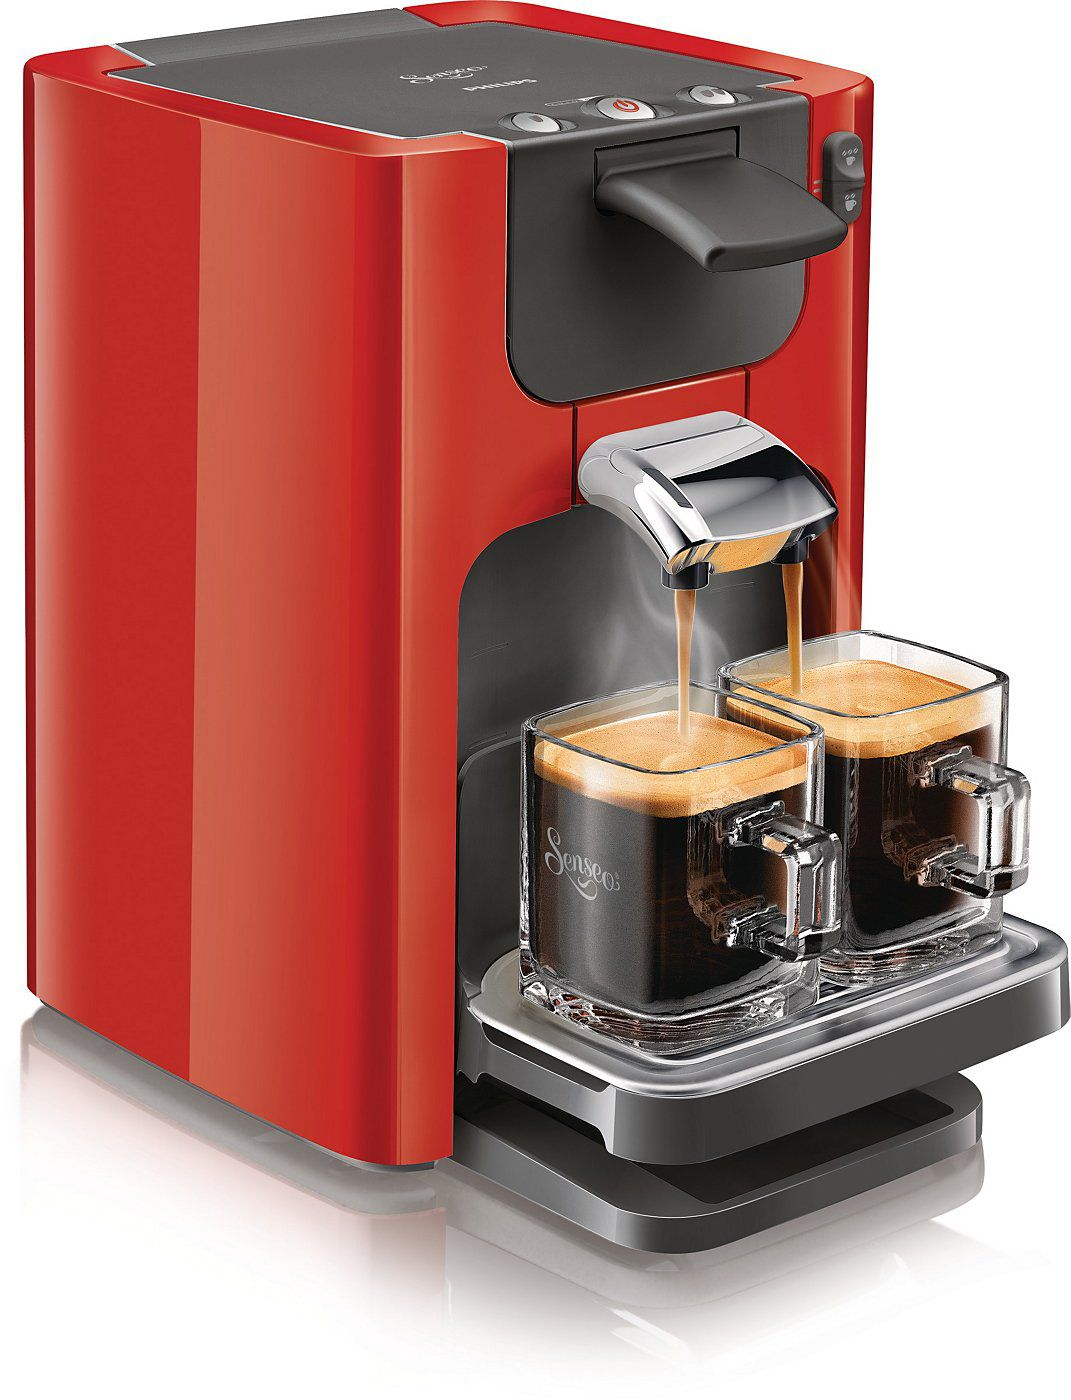 machine caf dosette senseo quadrante hd7864 81. Black Bedroom Furniture Sets. Home Design Ideas